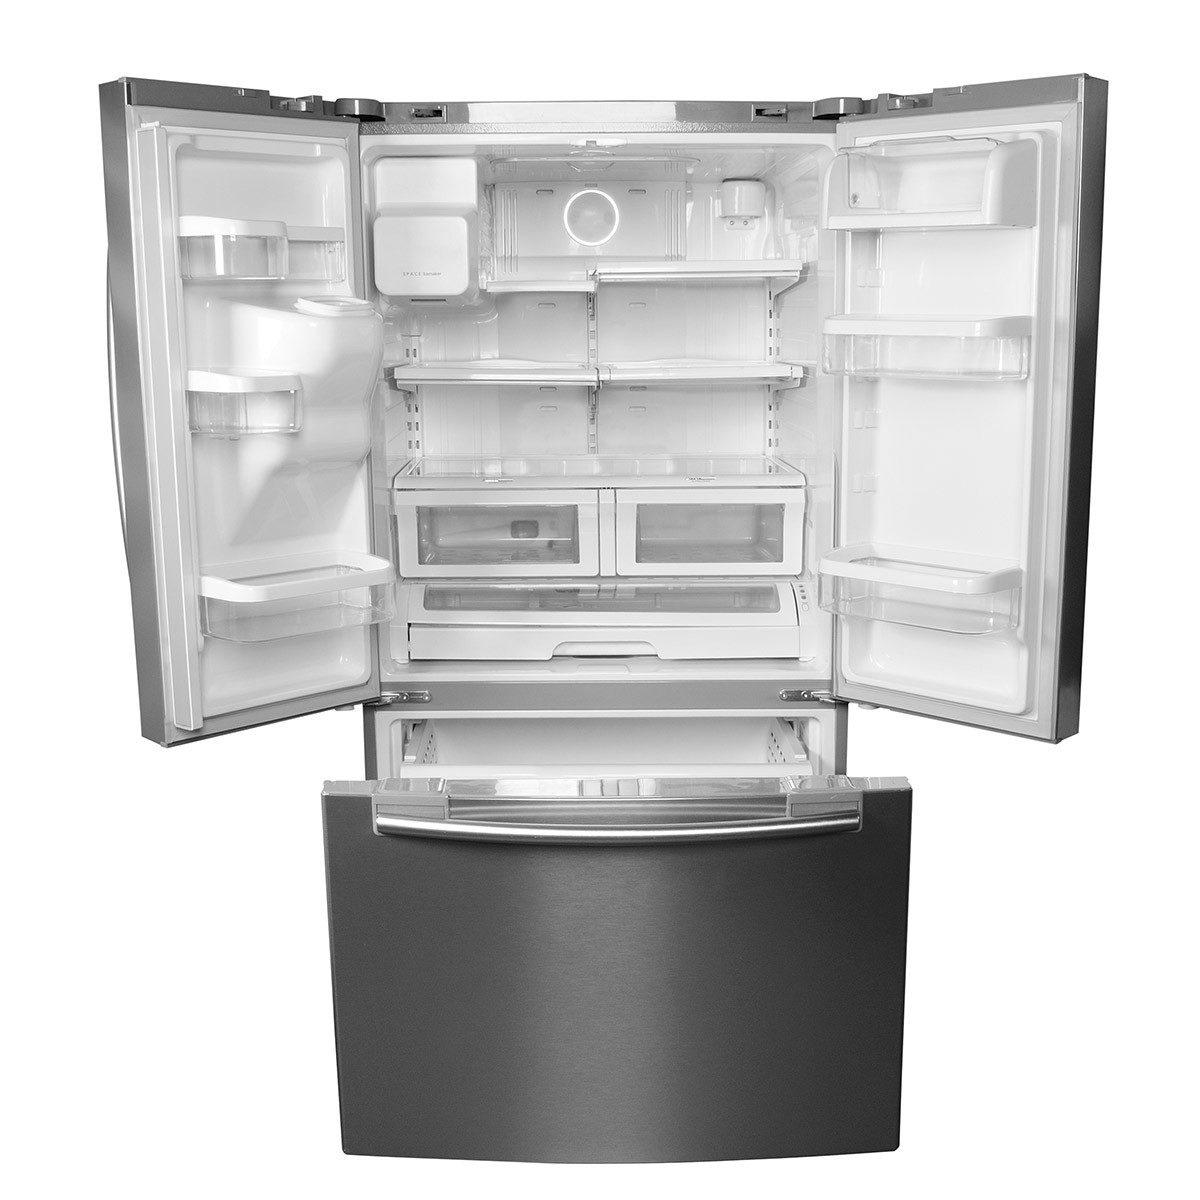 Protect appliances